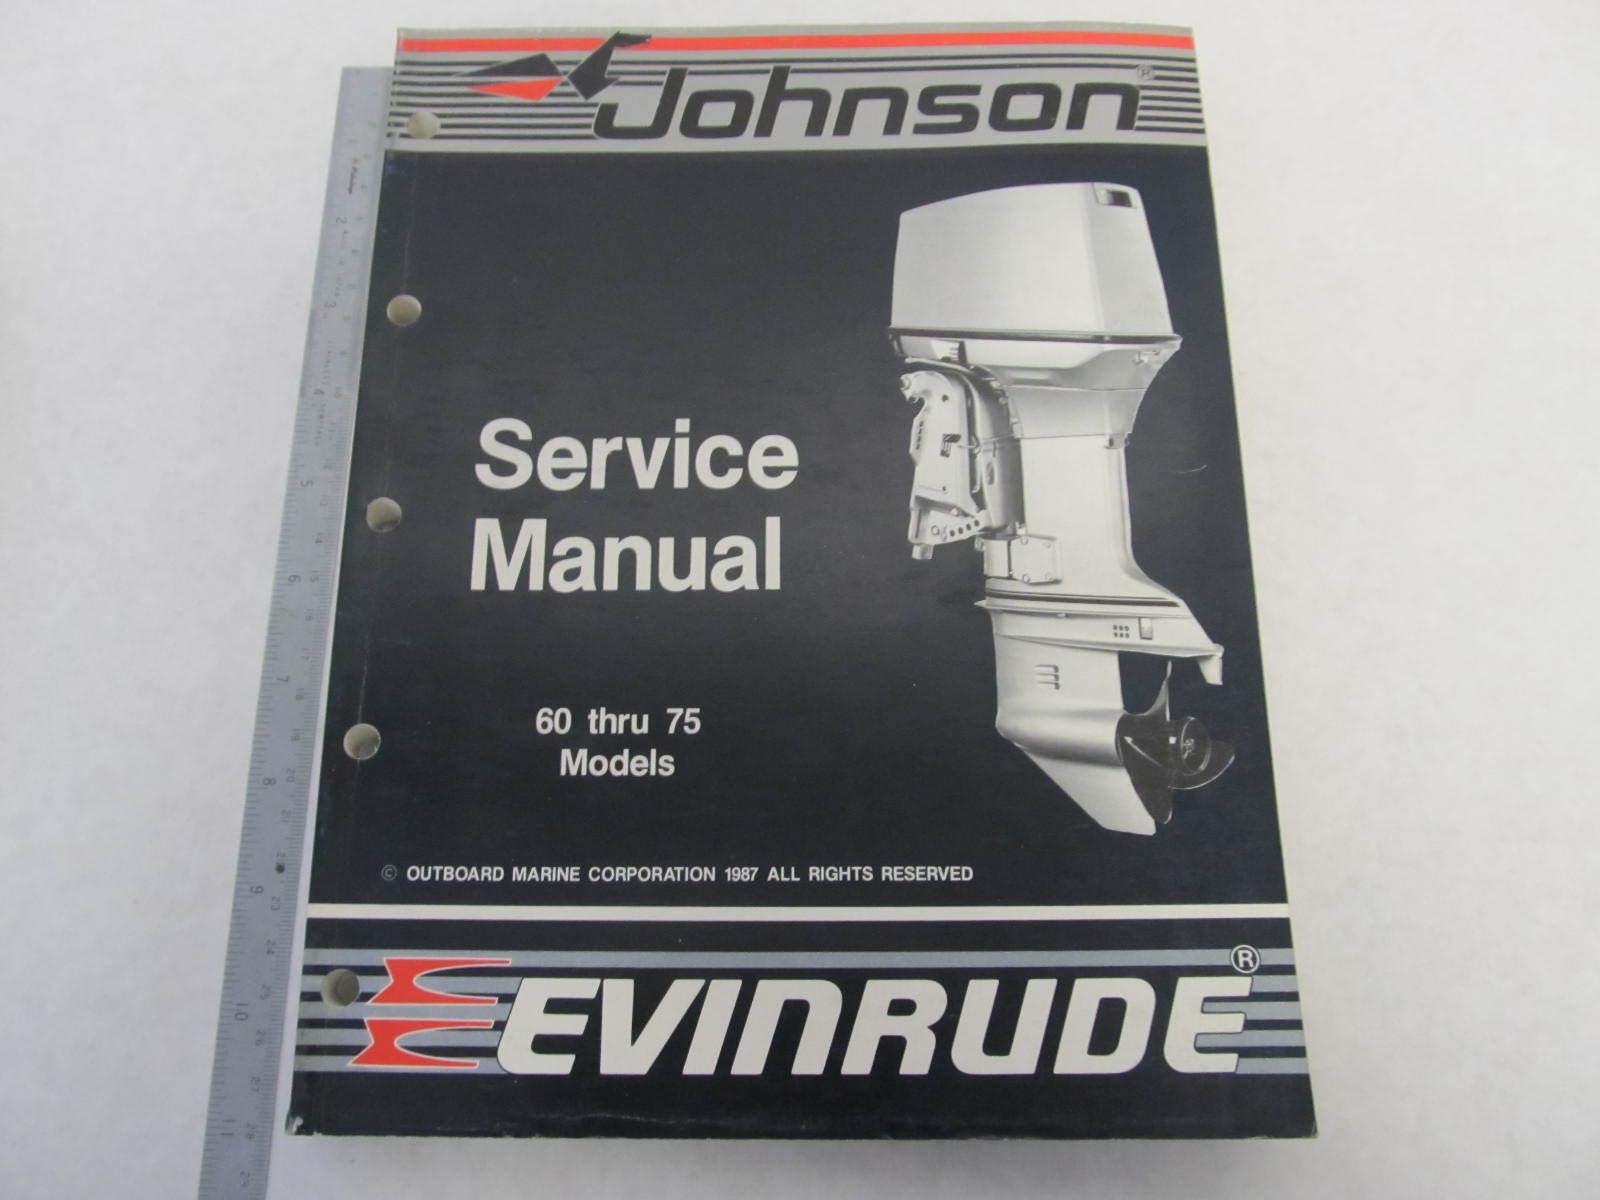 507662 johnson evinrude outboard service manual  quot cc quot  60 75 omc repair manual pdf omc repair manual pdf